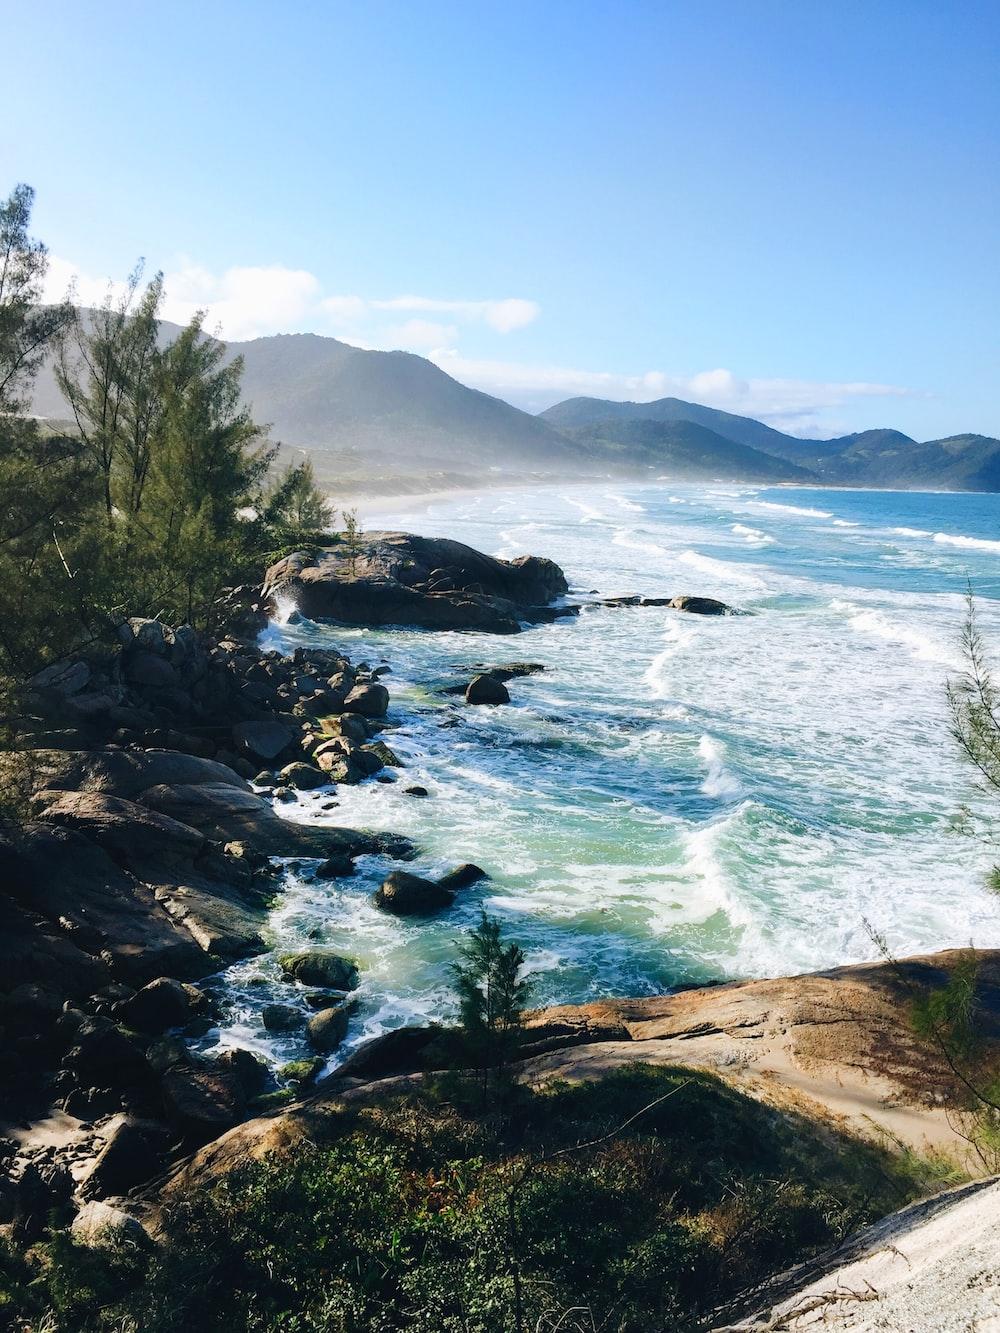 photo of seashore and mountain scenery